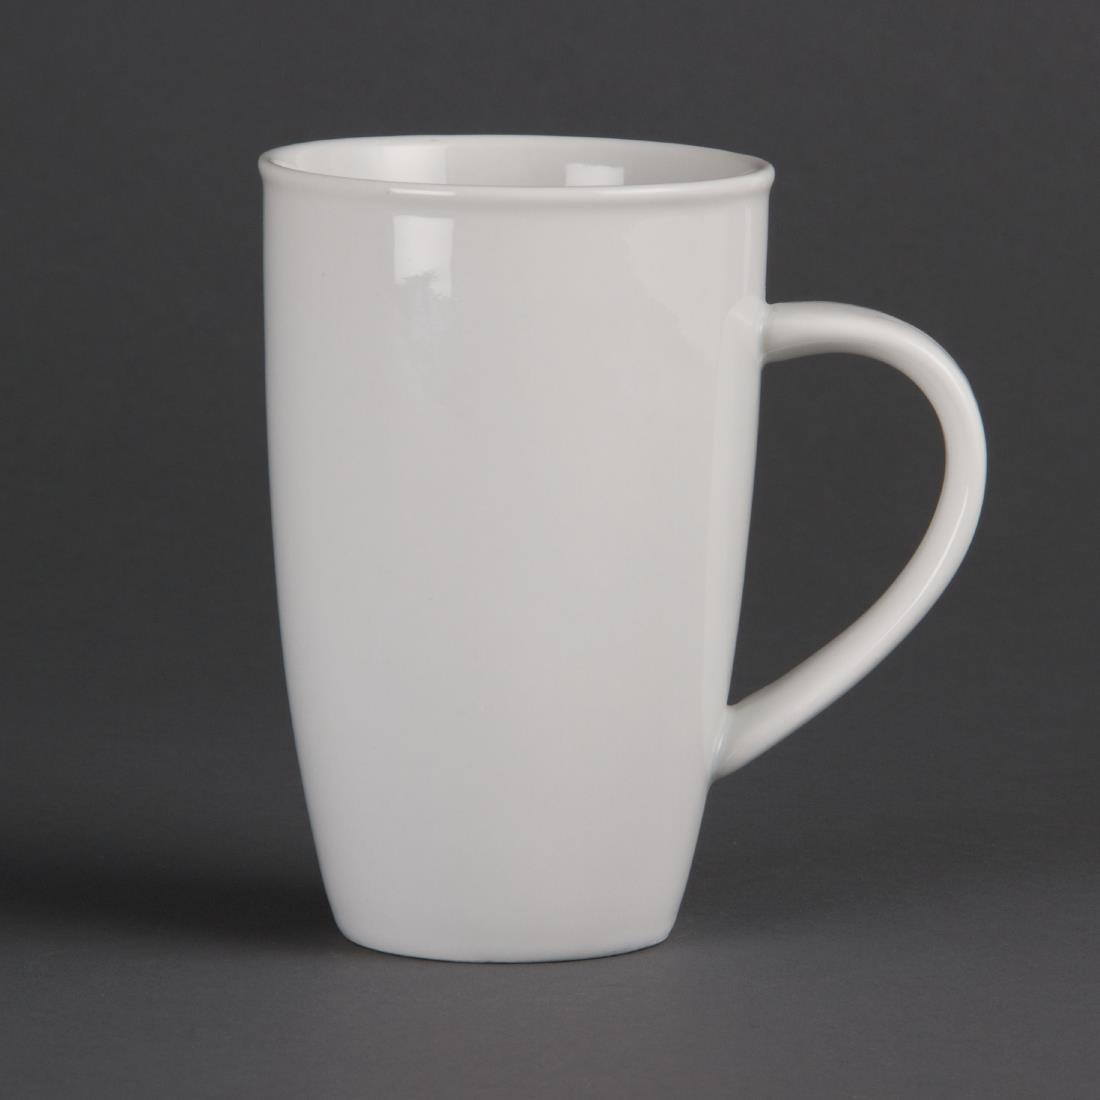 Tapered Latte Mug